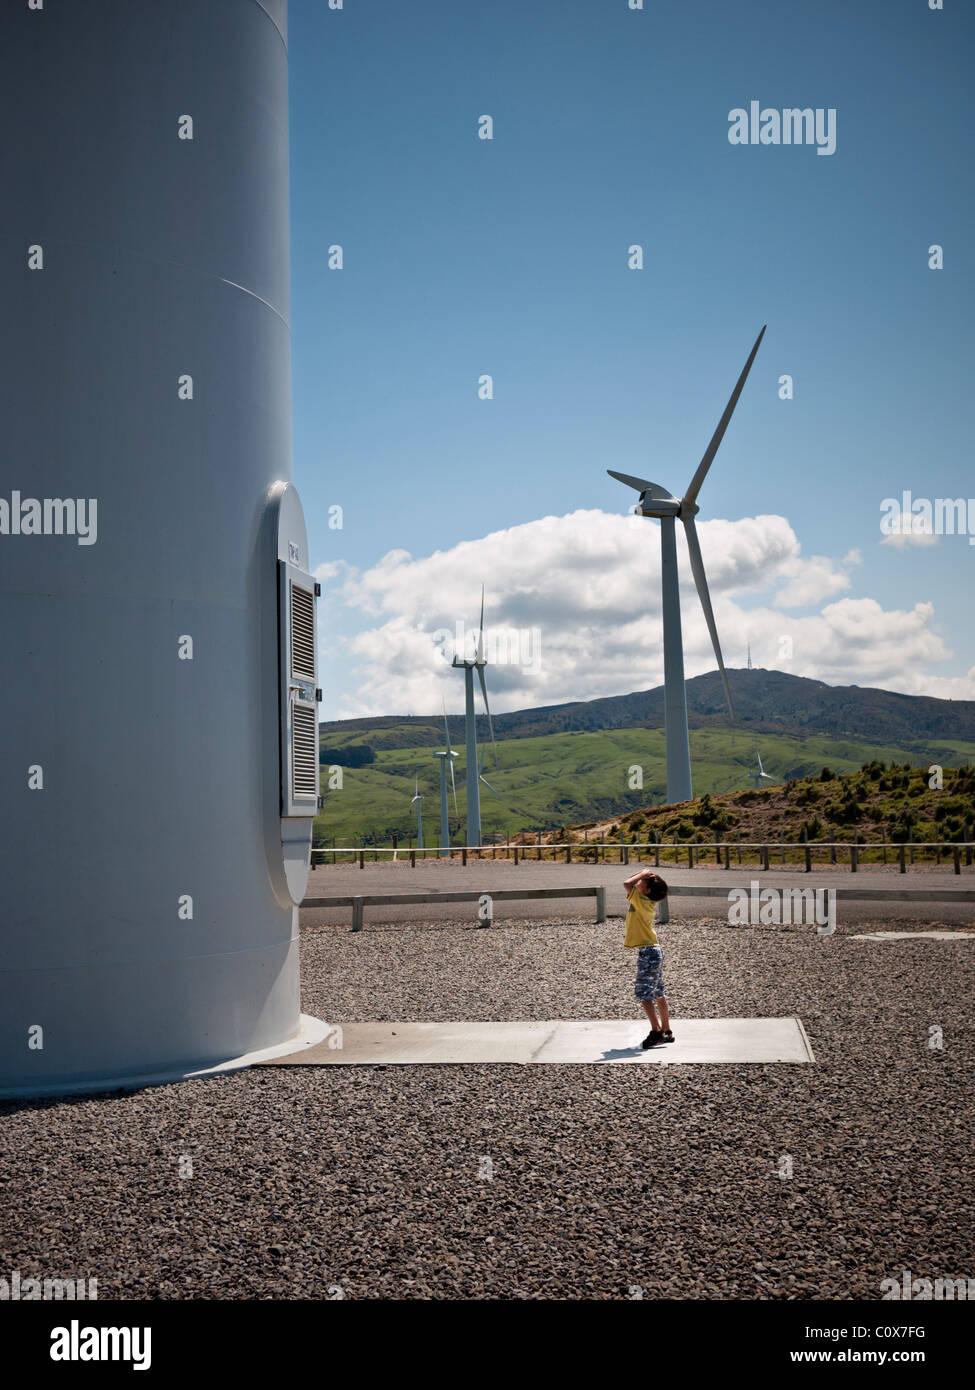 Junge schaut zu Windkraftanlage, Windpark Te Apiti, Neuseeland. Stockbild